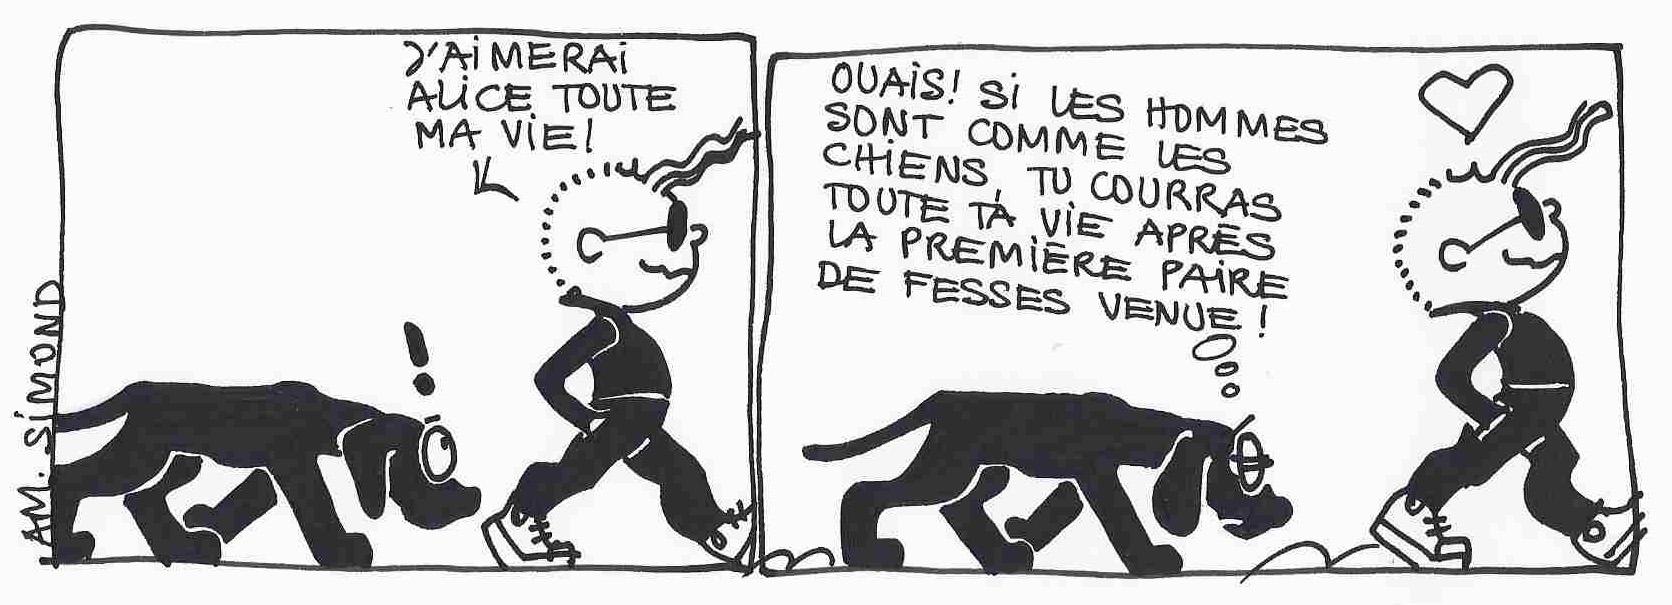 dp-%c2%a9-anne-marie-simond_comics_annees-80_serie-la-petite-alice-116_rotring_107-ko